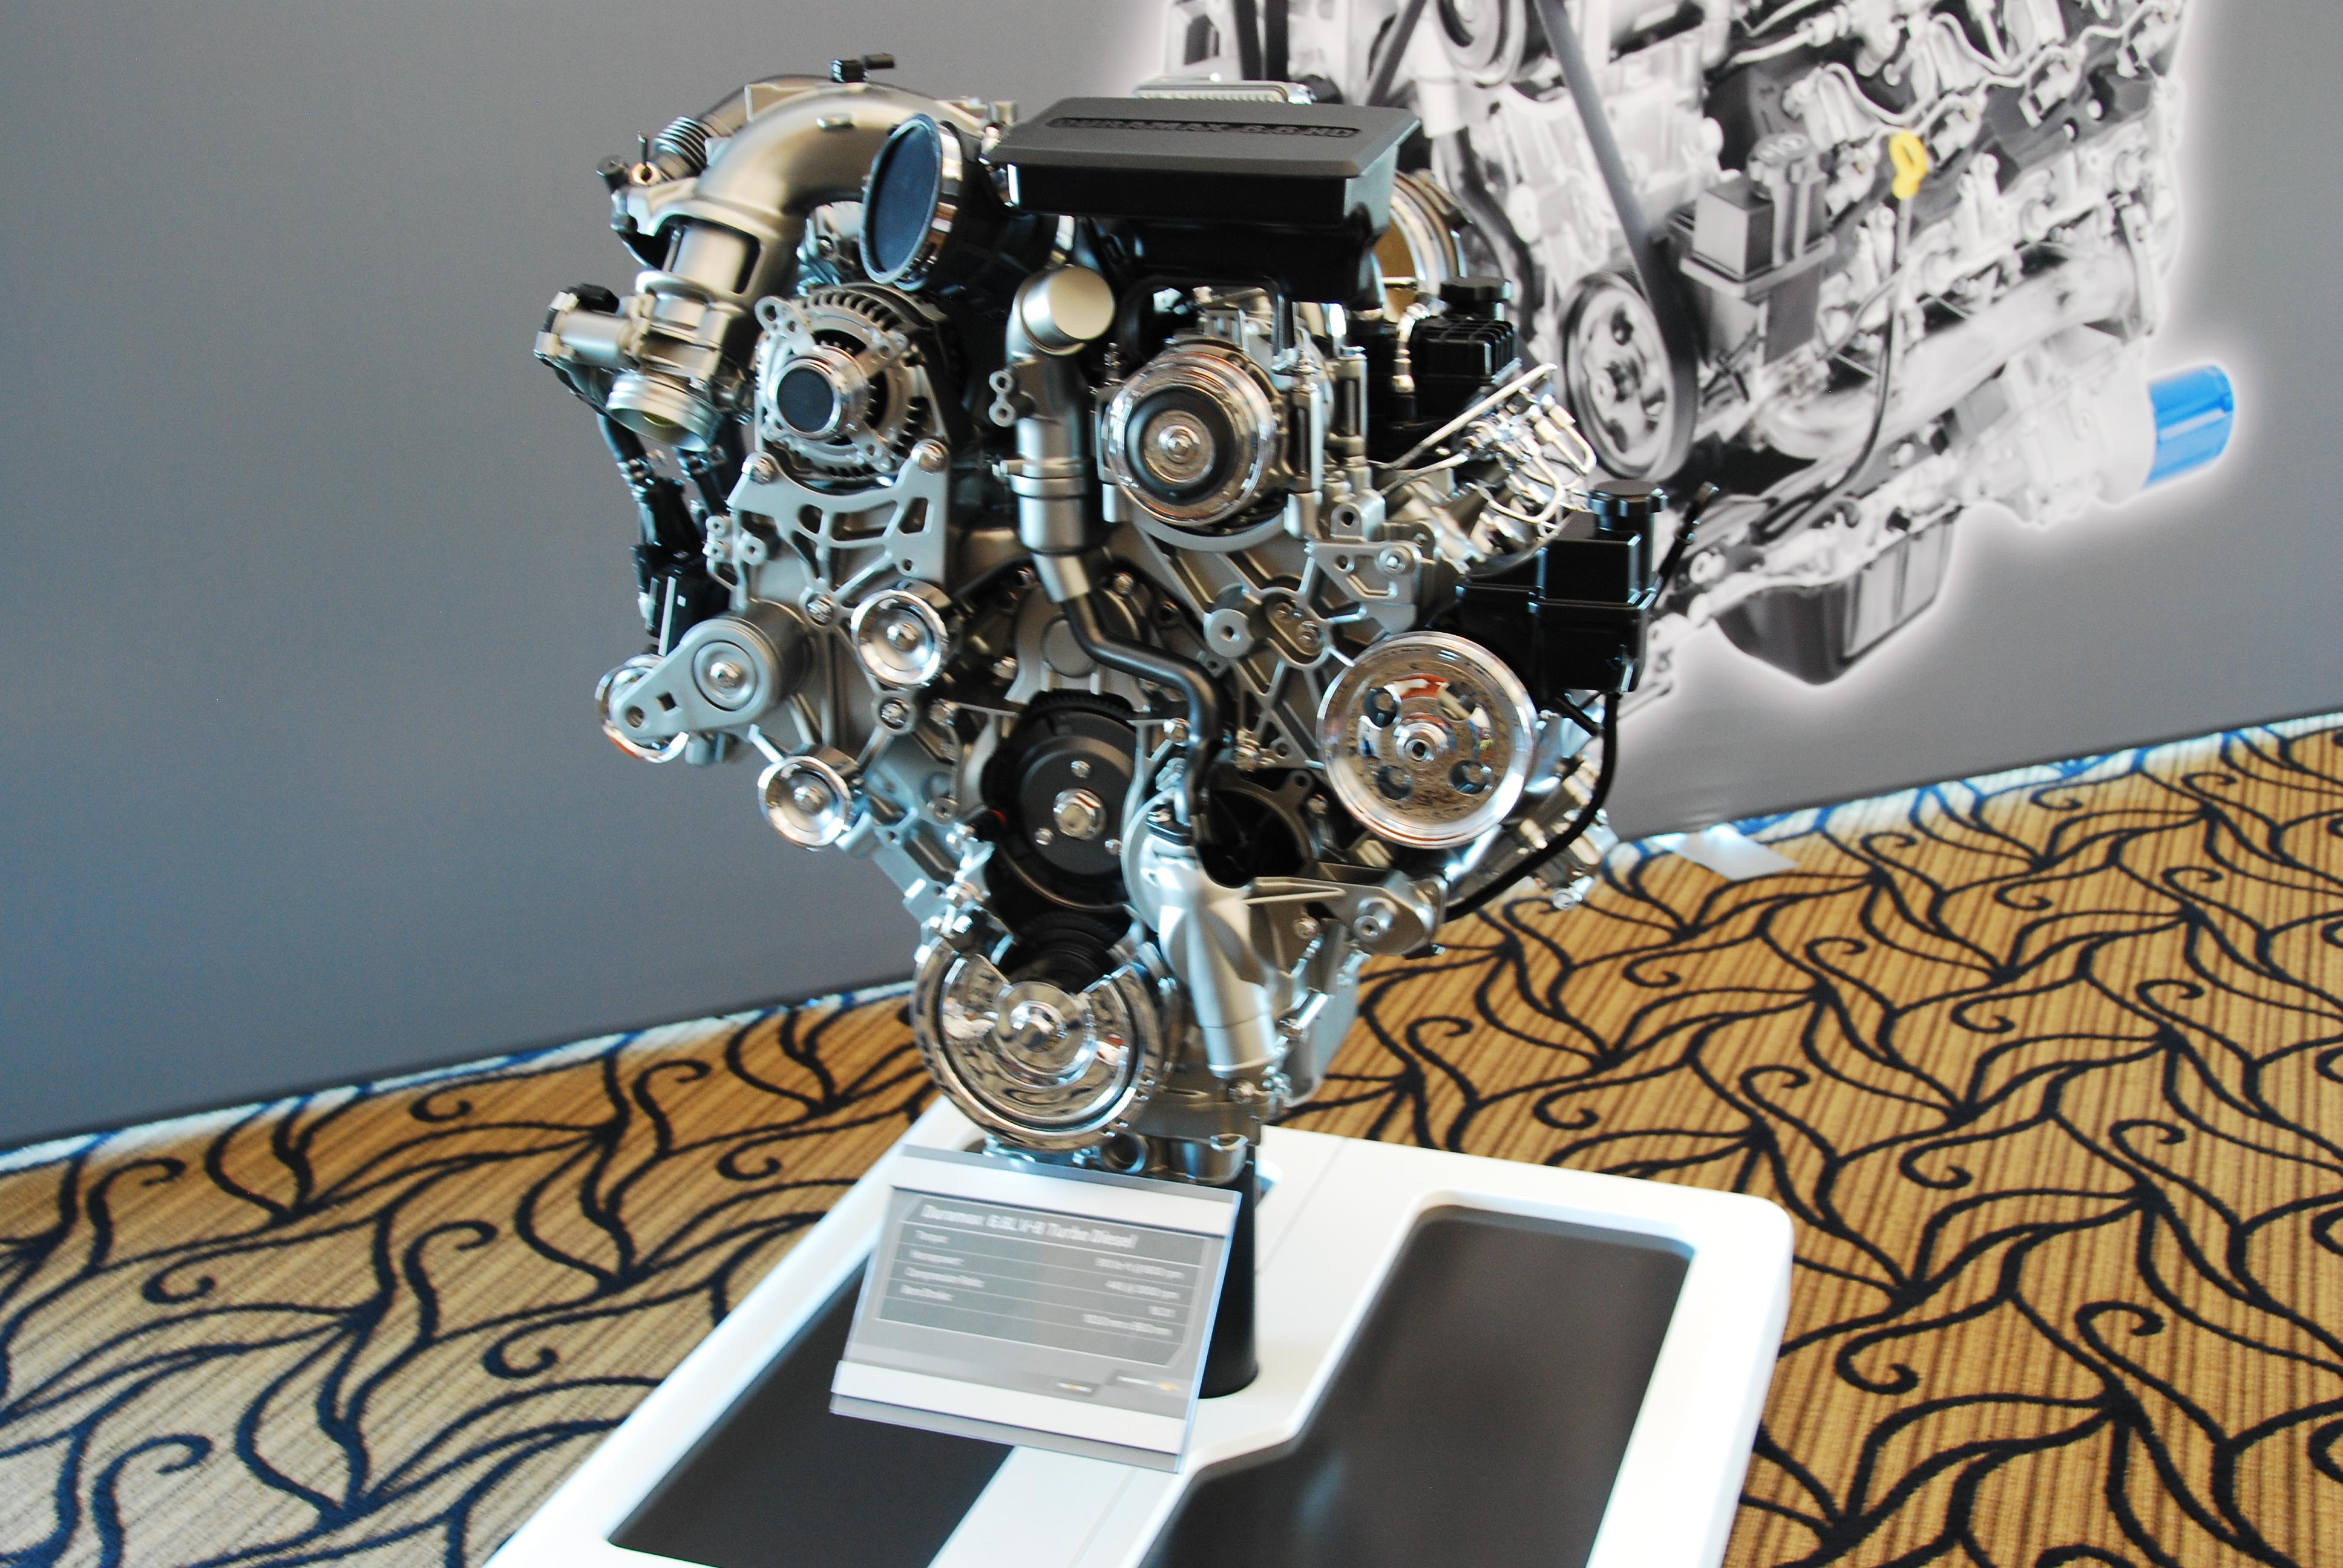 Chevrolet Silverado HD's 6.6L Duramax Diesel